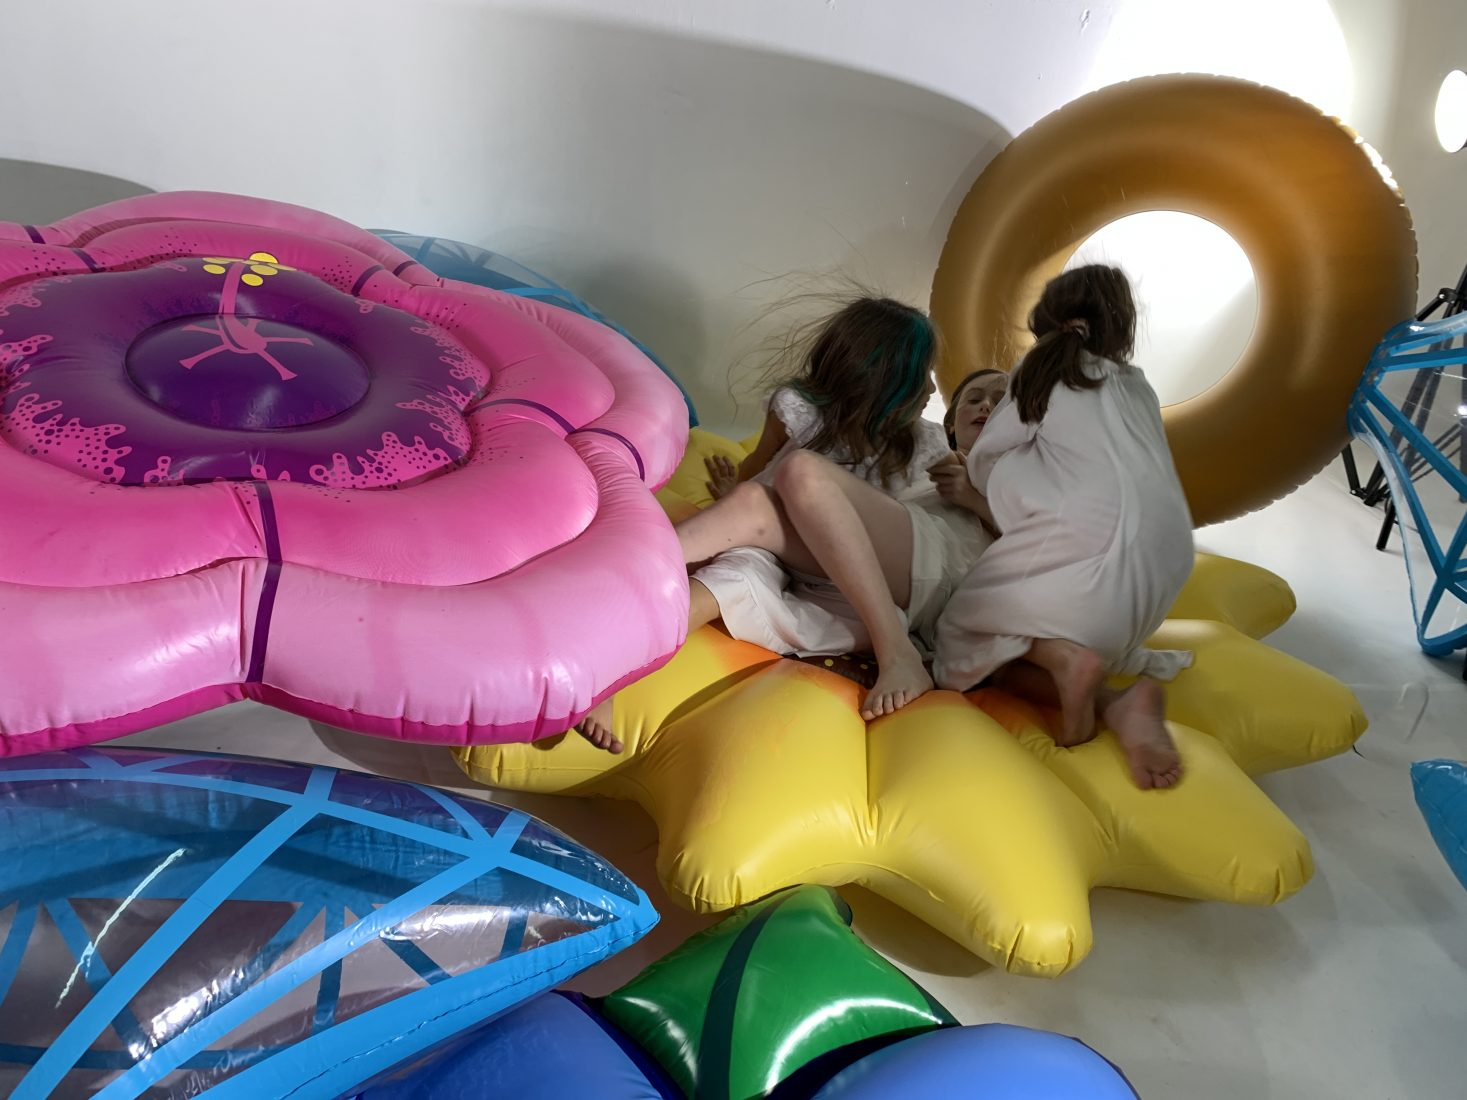 Daniela Kostova. Princess Beauty, 2020, video, inflatable objects, Leo Kuelbs Collection